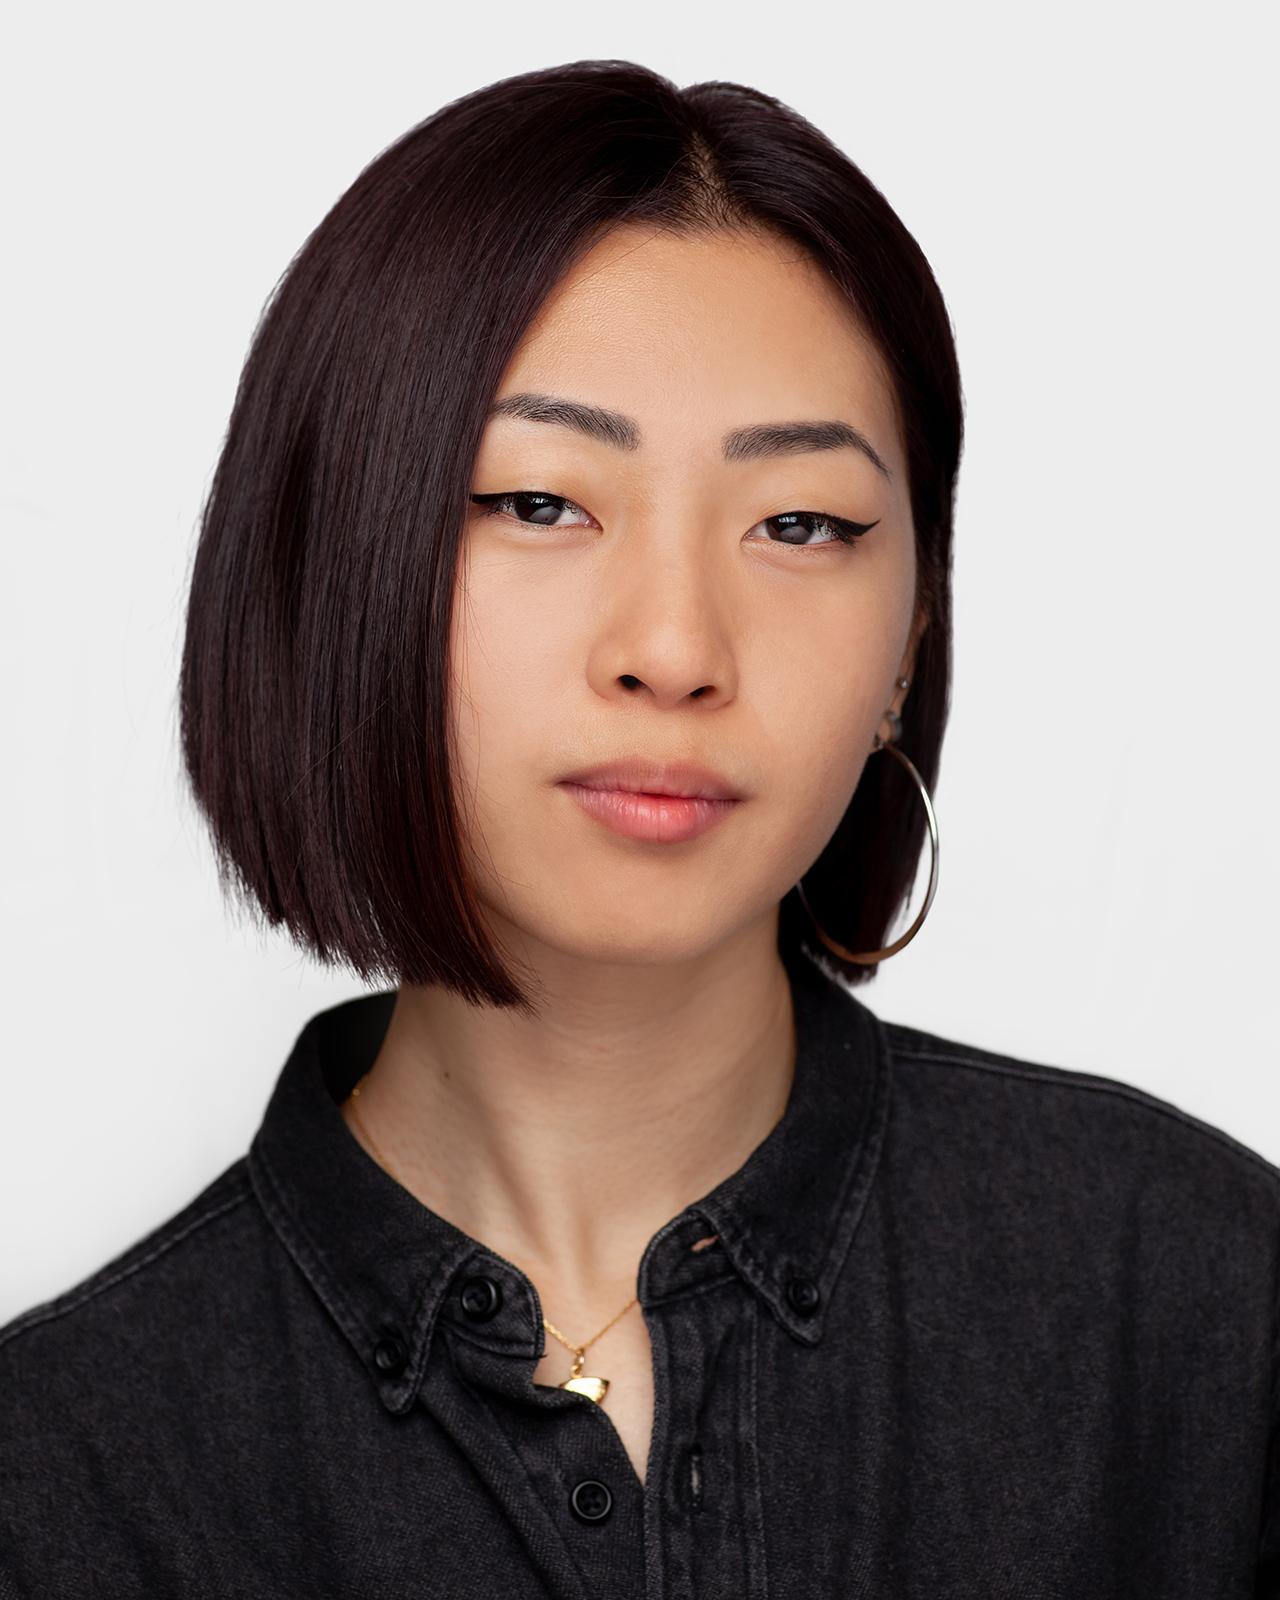 Hyunji, 2019